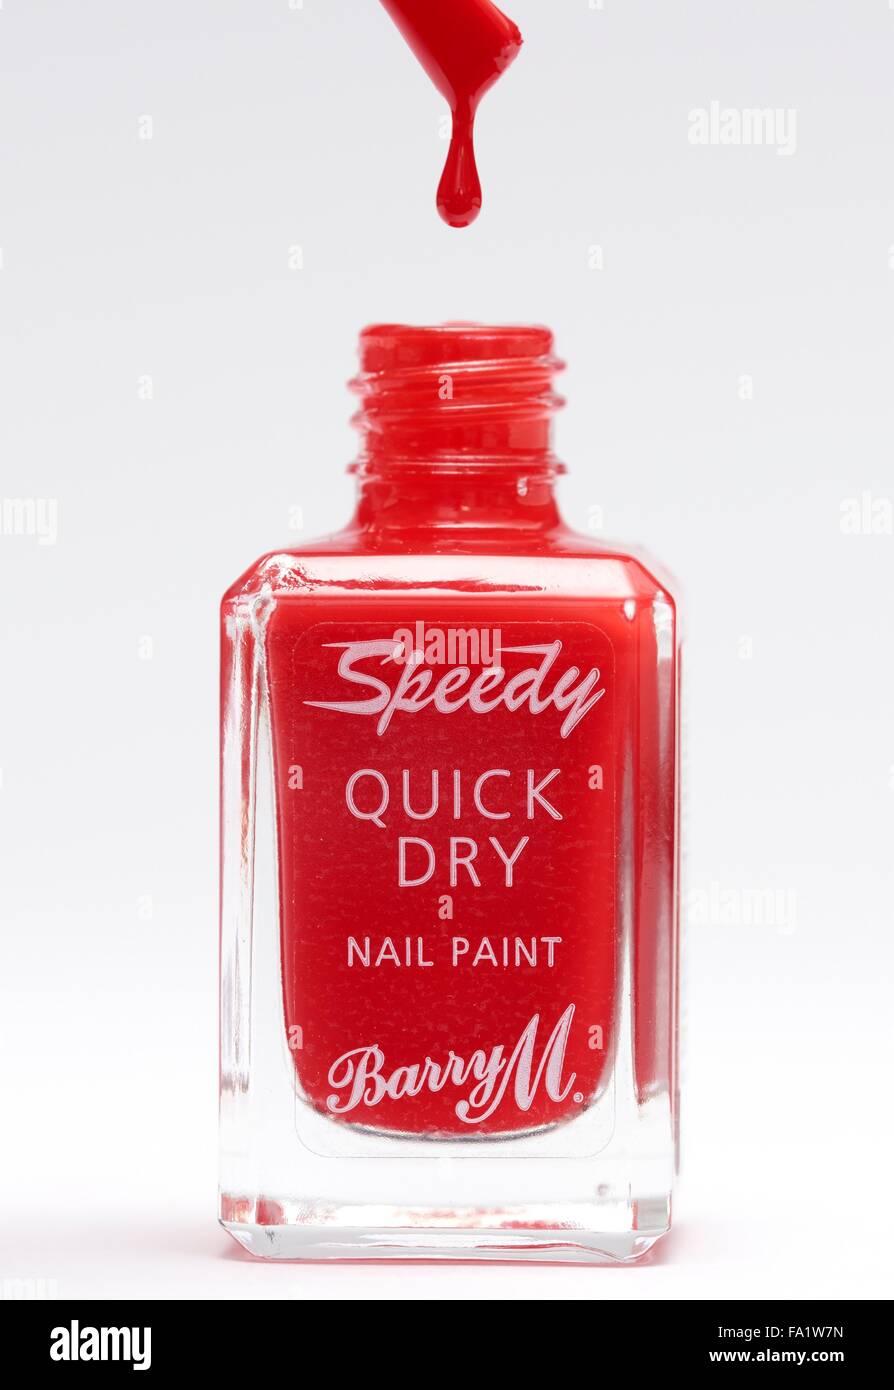 Nail Paint Bottle Stock Photos & Nail Paint Bottle Stock Images - Alamy